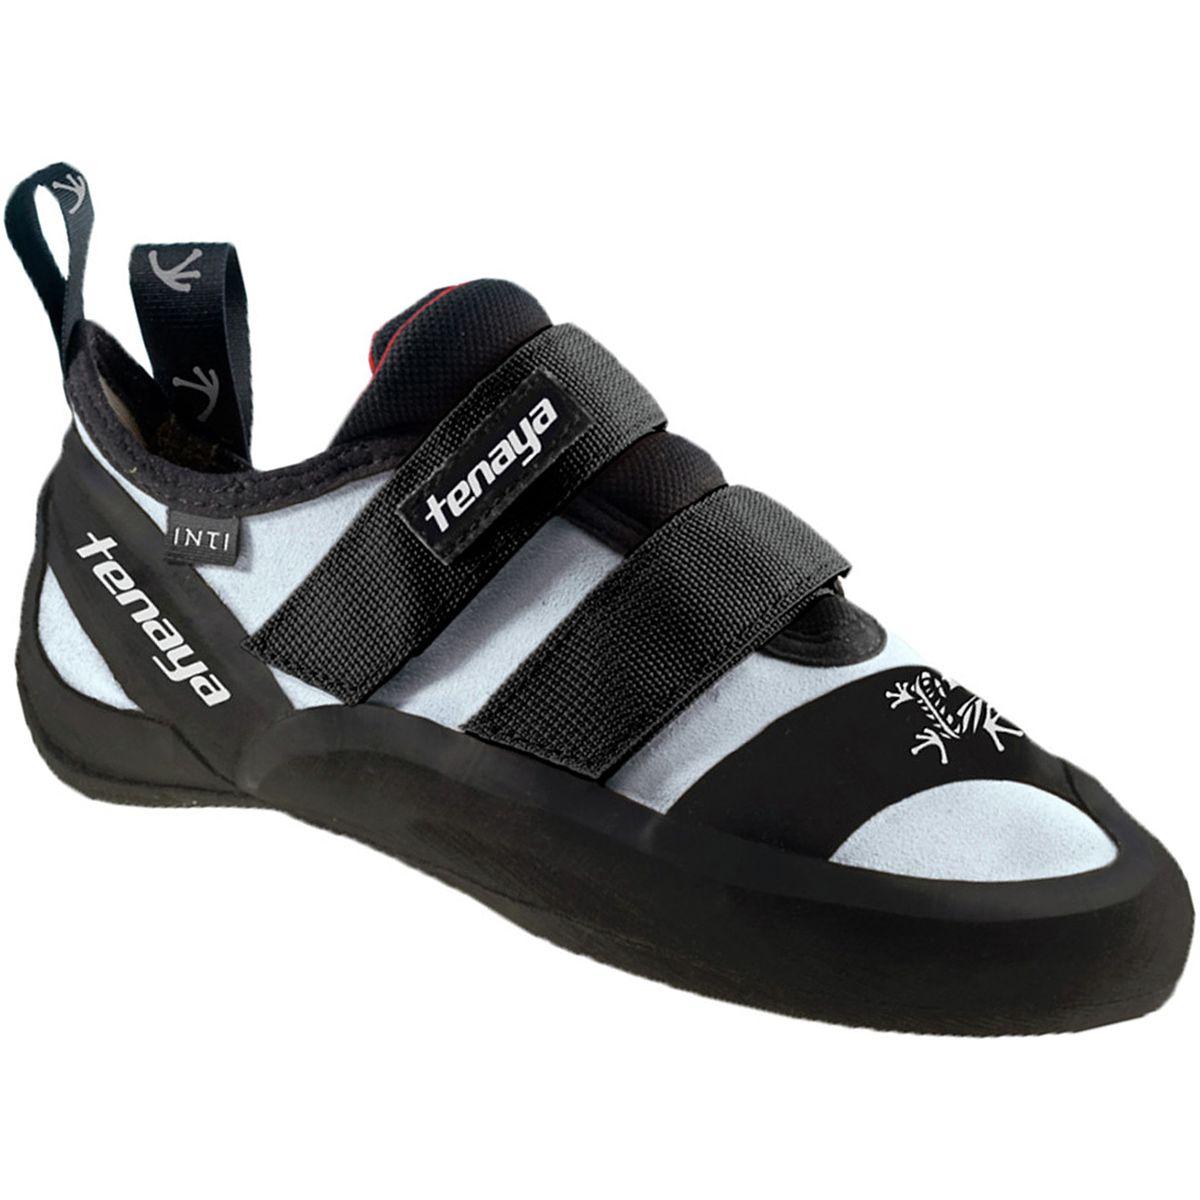 photo: Tenaya Inti climbing shoe